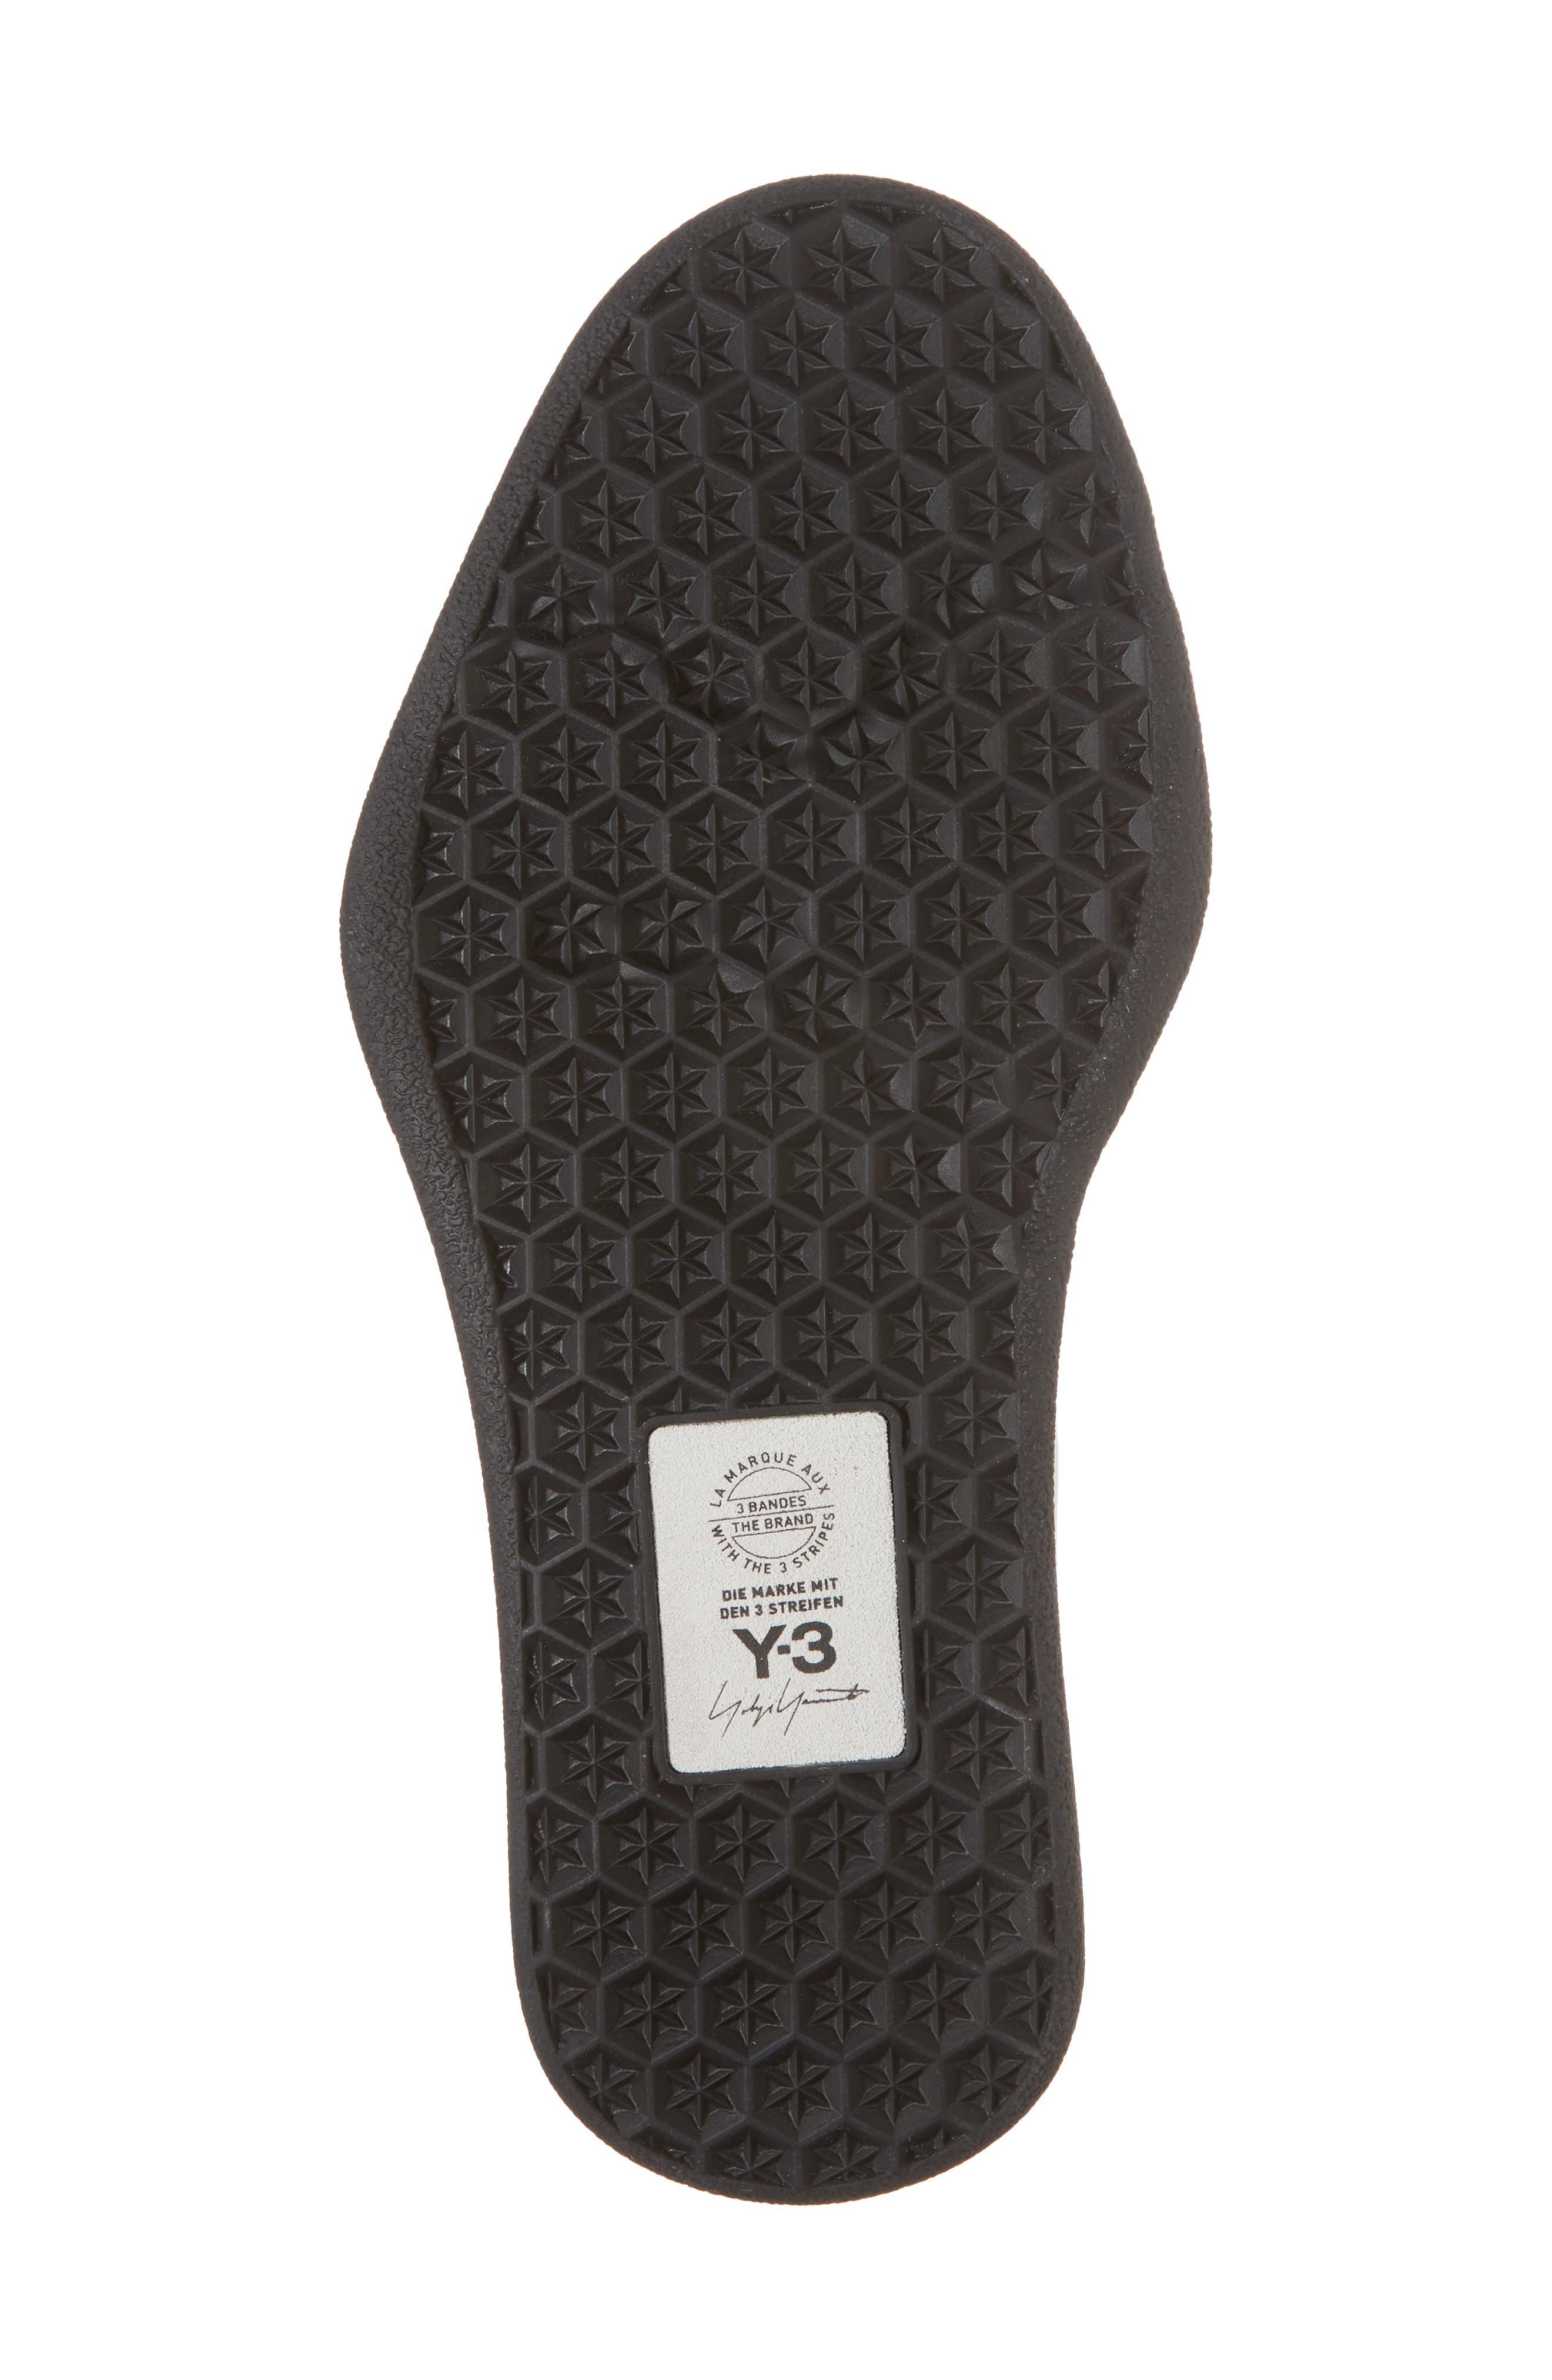 Bashyo High Top Sneaker,                             Alternate thumbnail 6, color,                             White/ Black